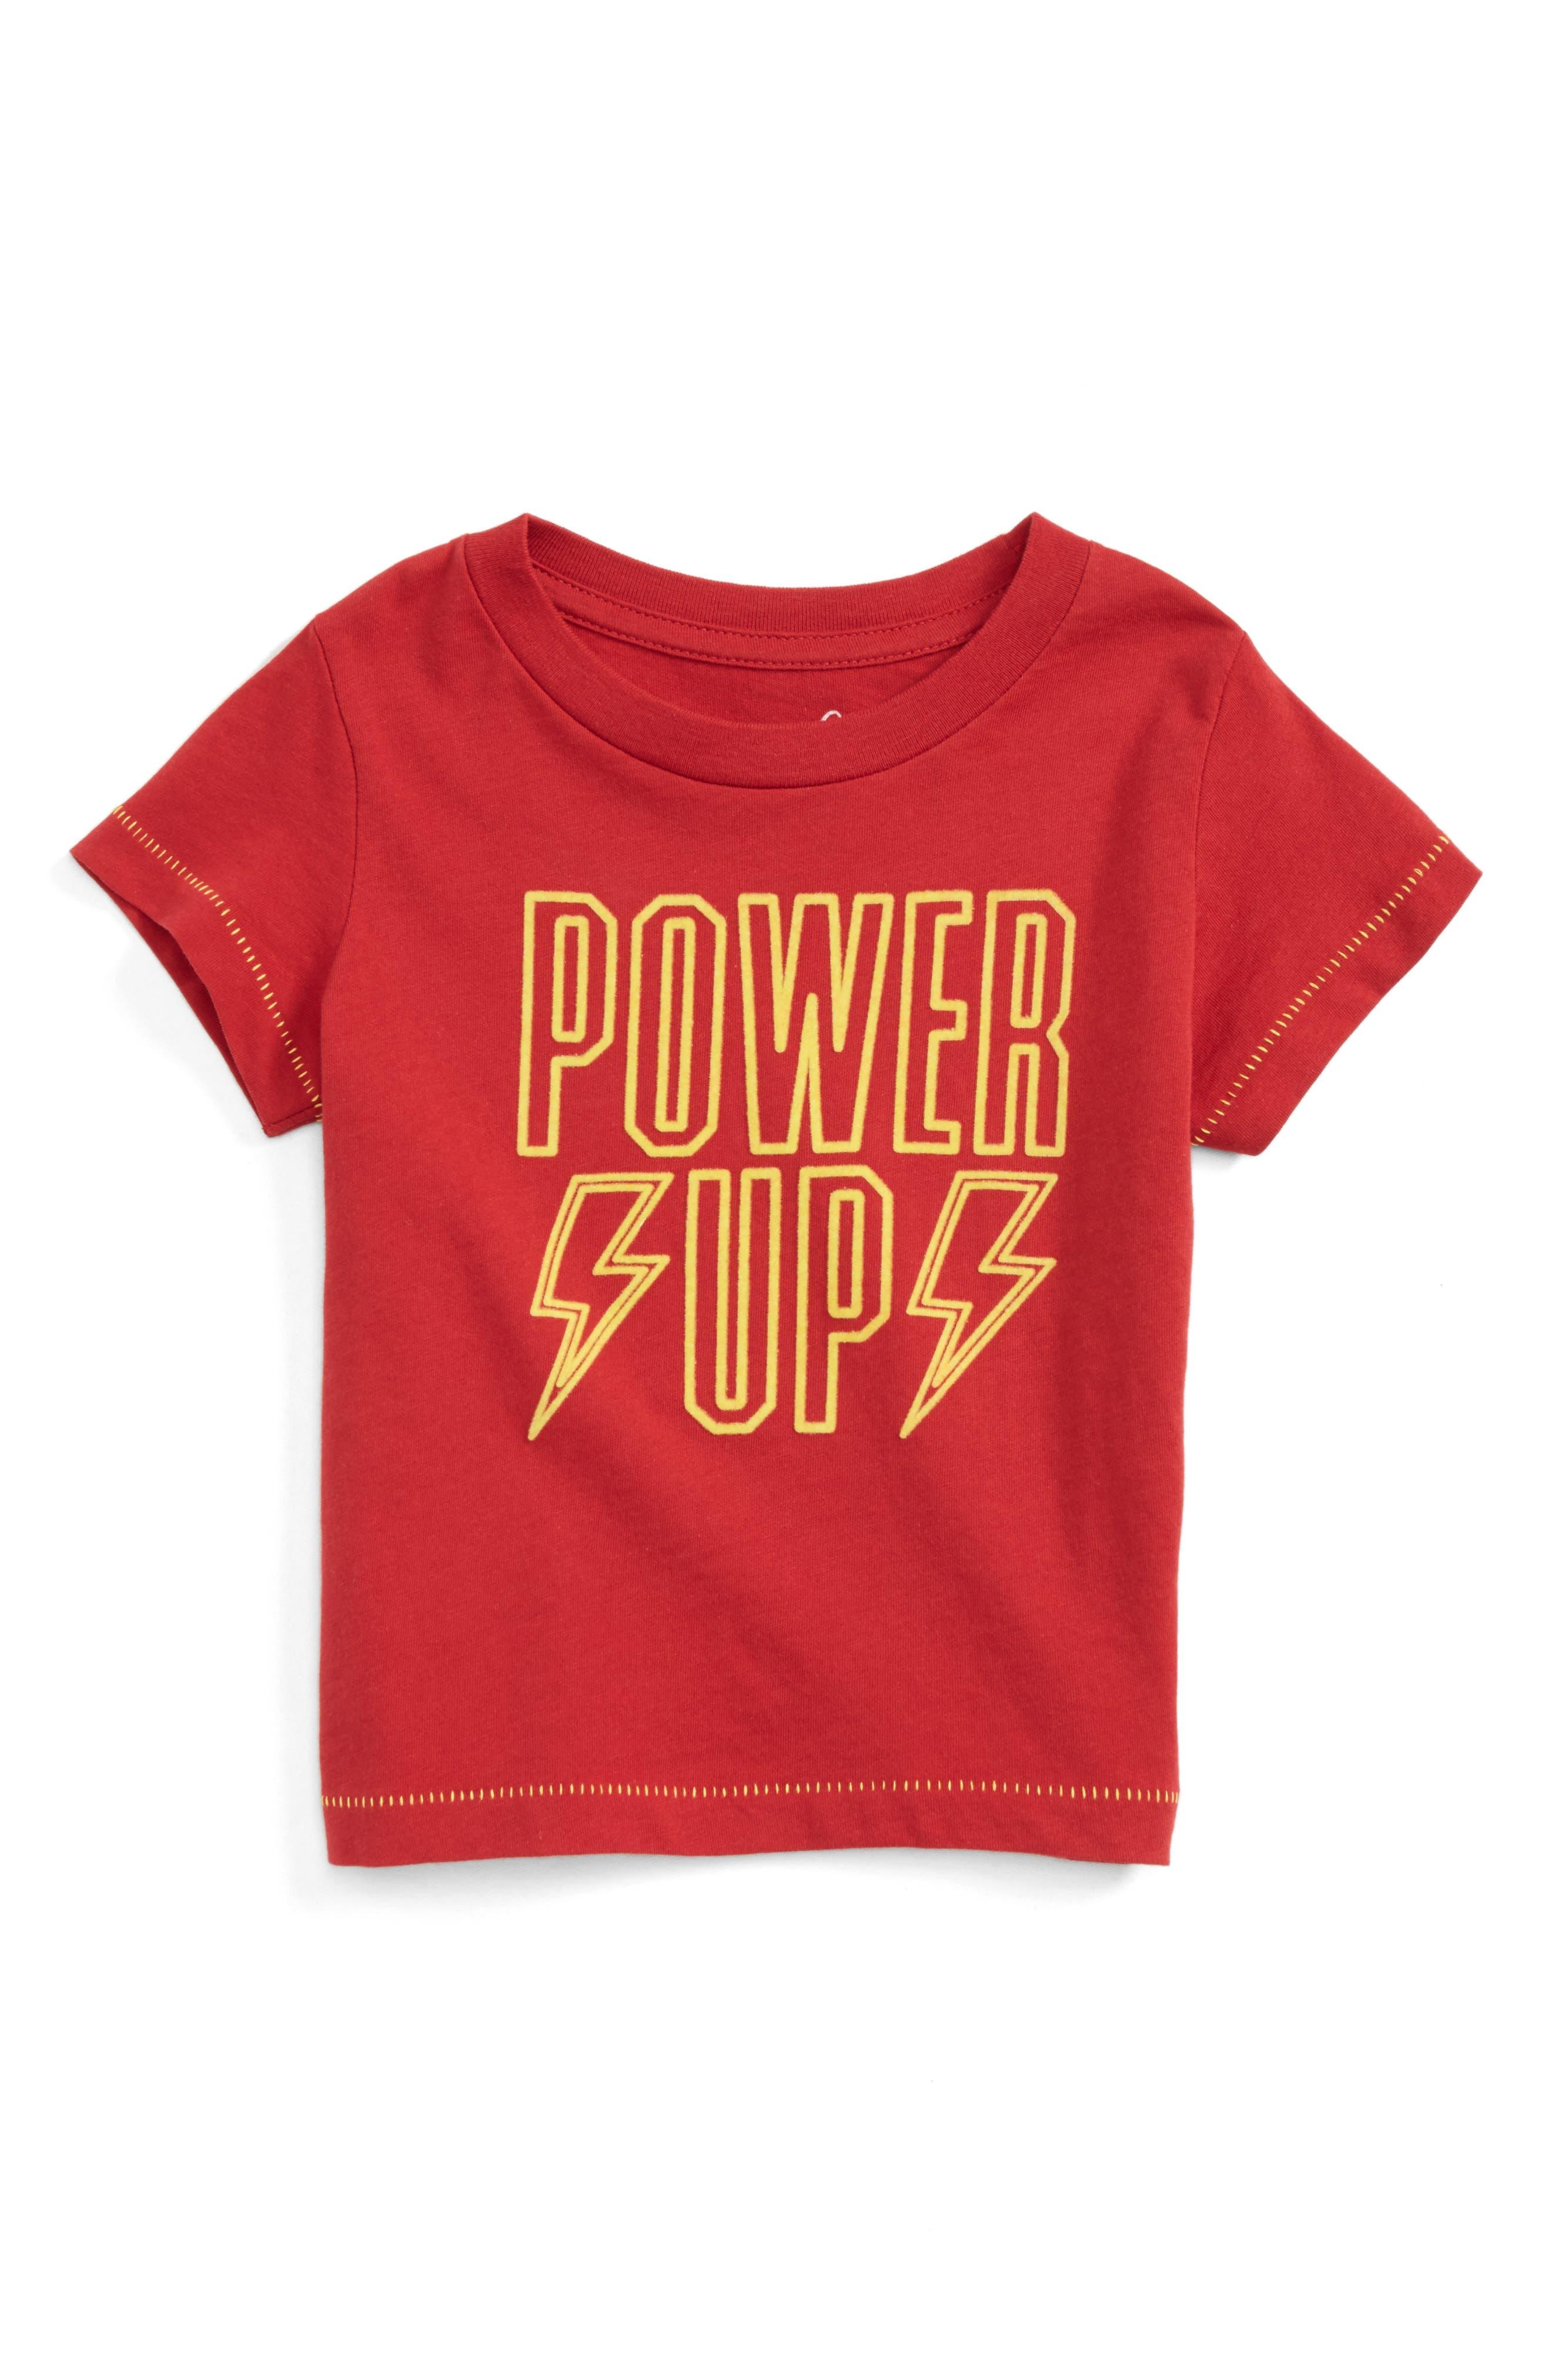 Alternate Image 1 Selected - Peek Power Up T-Shirt (Baby Boys)